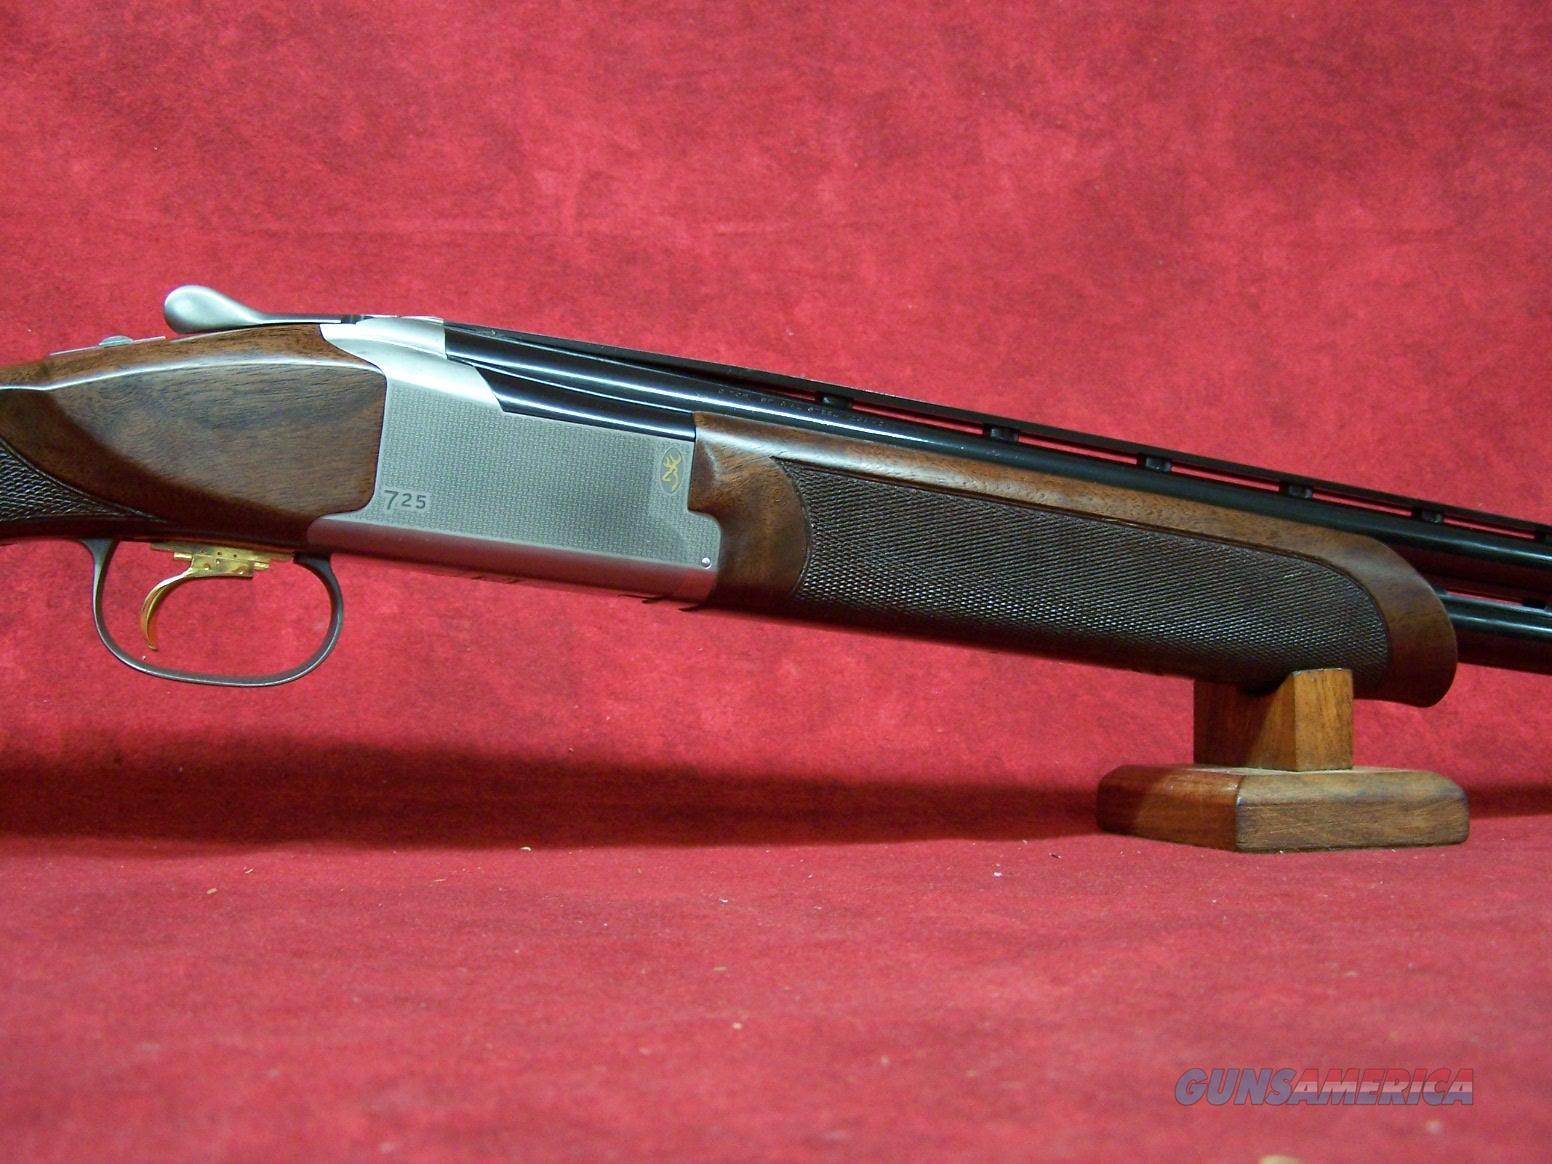 "Browning Citori 725 Sporting 12ga 3"" Chamber 32"" Ported Barrel (0135313009)  Guns > Shotguns > Browning Shotguns > Over Unders > Citori > Trap/Skeet"